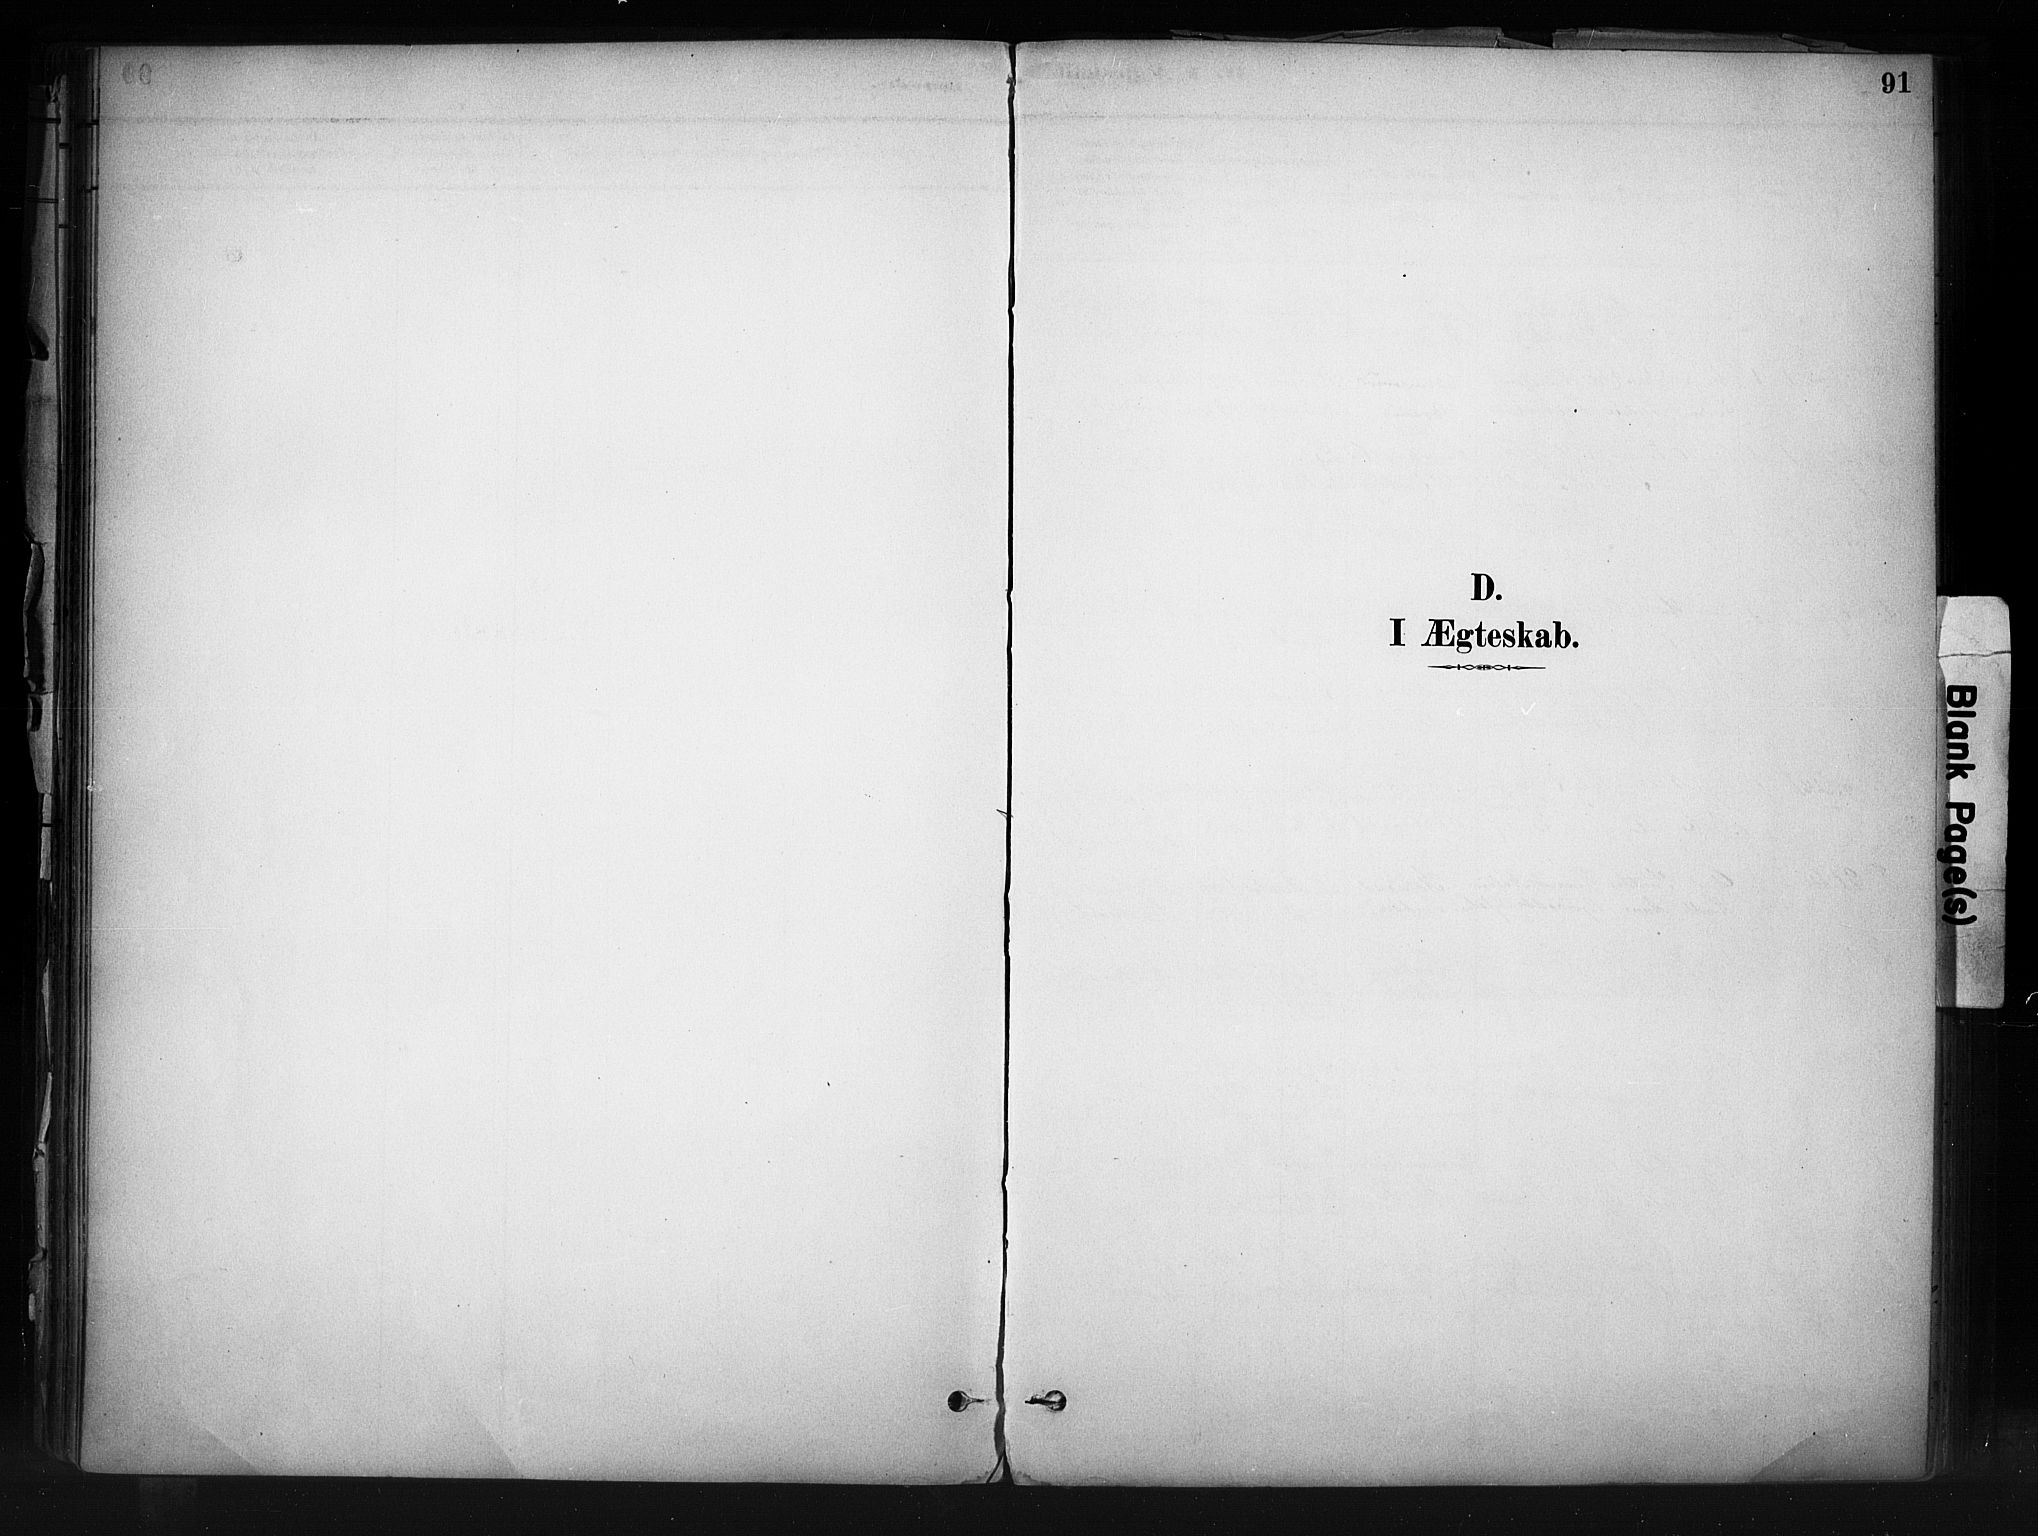 SAH, Nord-Aurdal prestekontor, Ministerialbok nr. 13, 1883-1895, s. 91